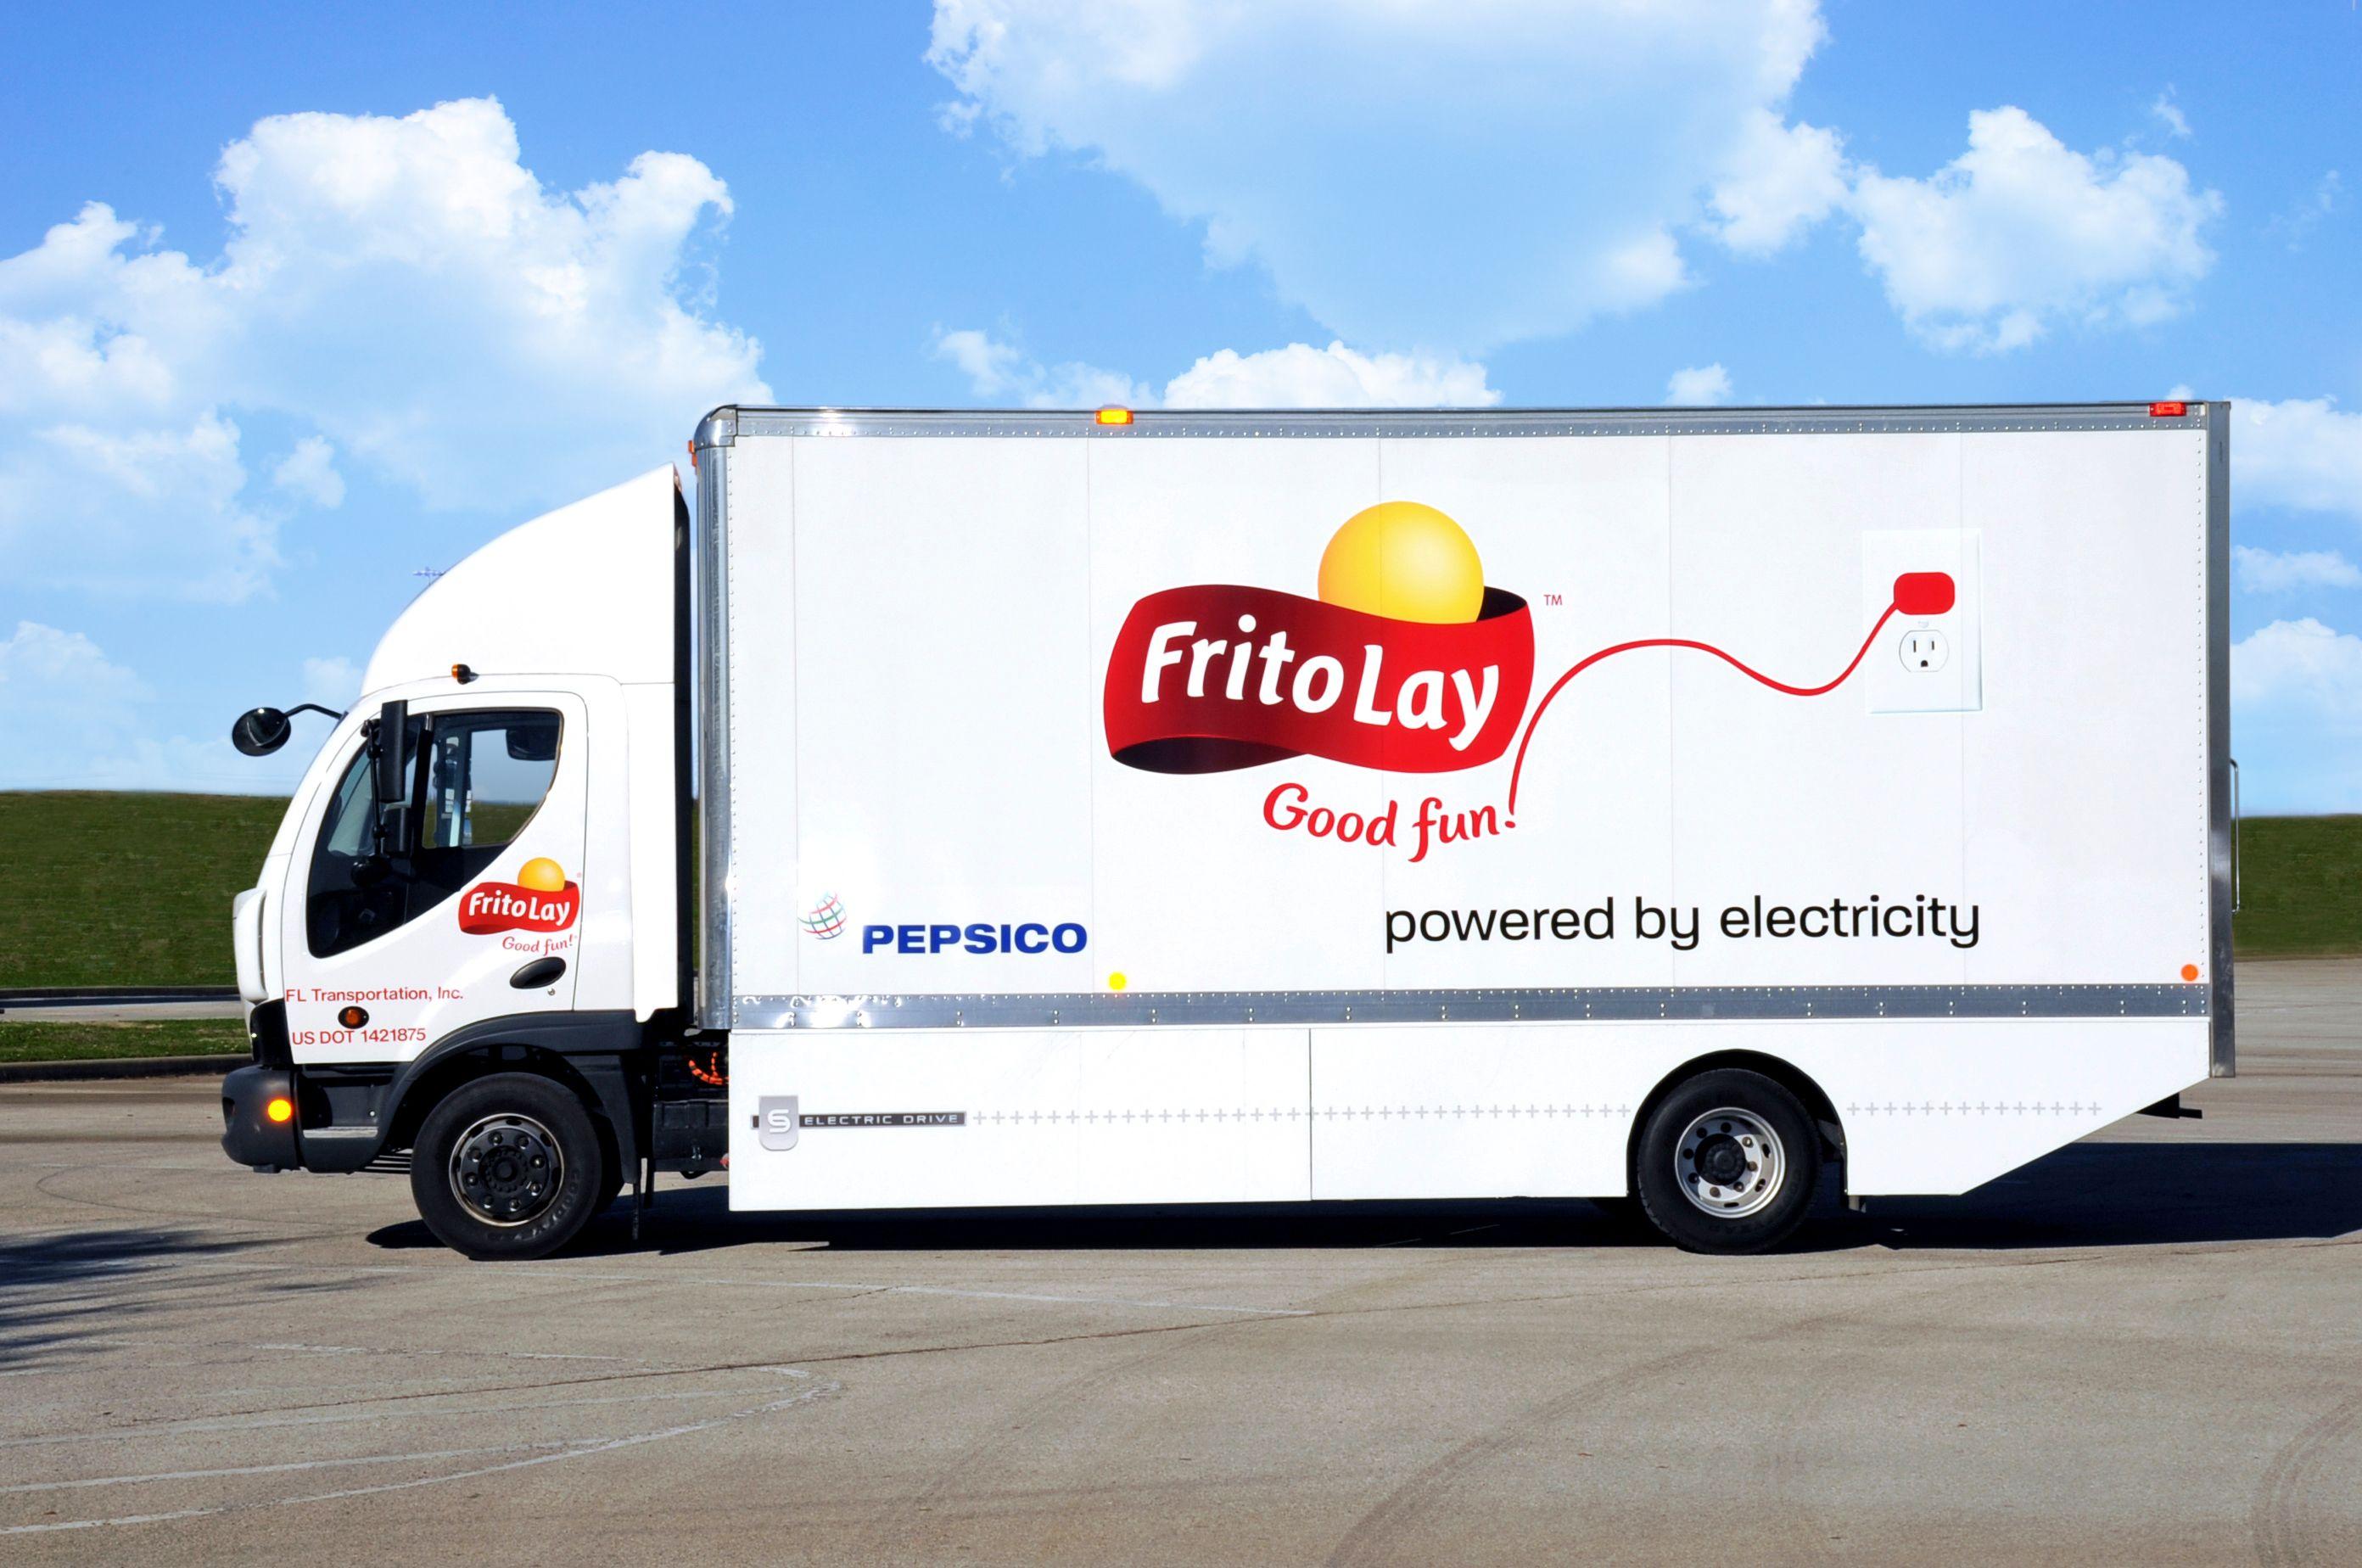 Electric Truck Cars Trucks Pinterest Frito Lay